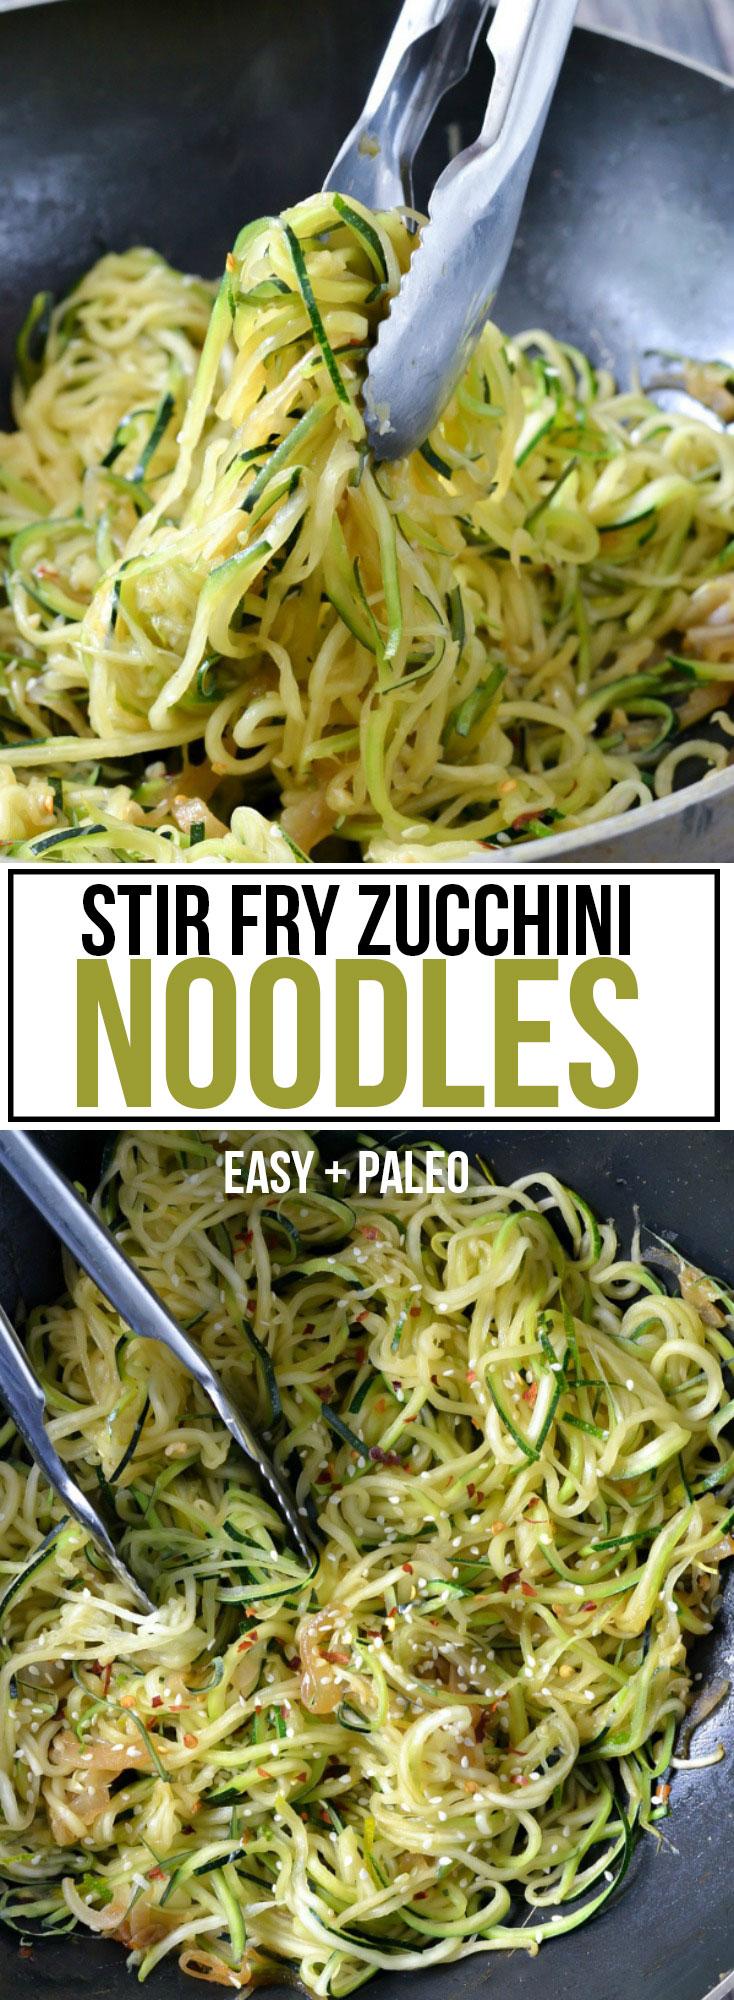 STIR FRY ZUCCHINI NOODLES (EASY + PALEO)